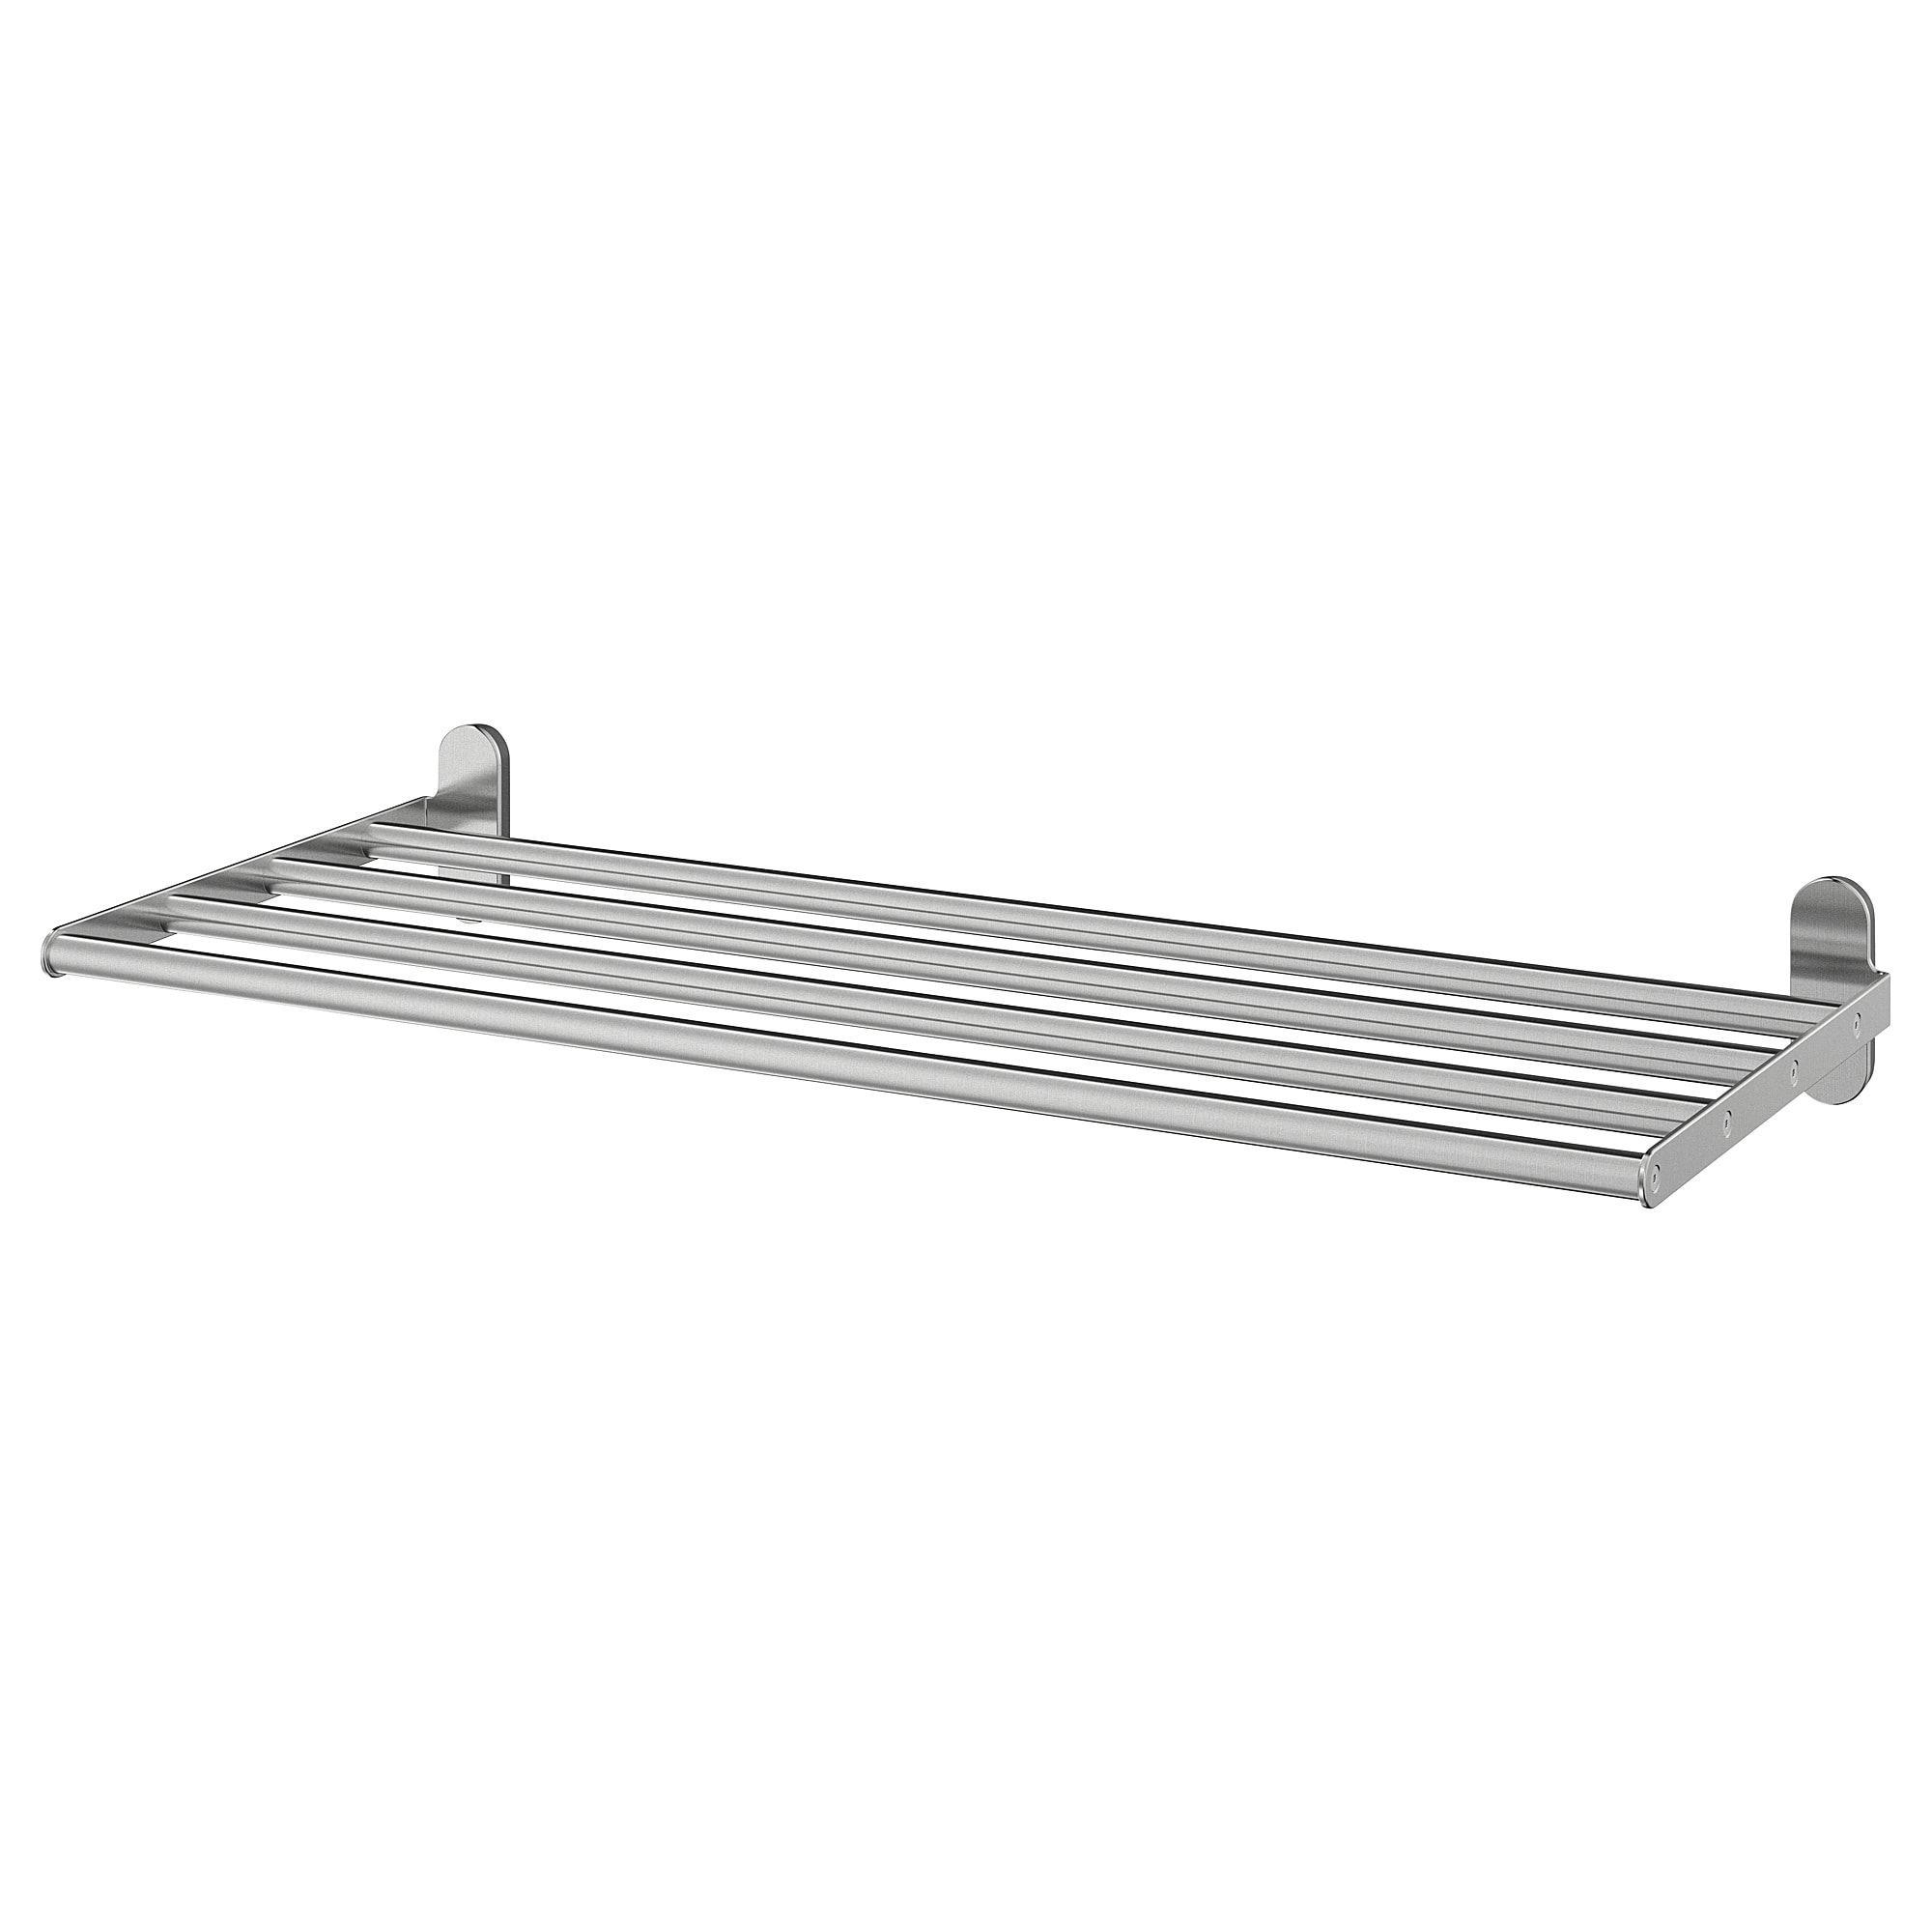 Ikea Brogrund Stainless Steel Wall Shelf With Towel Rail Towel